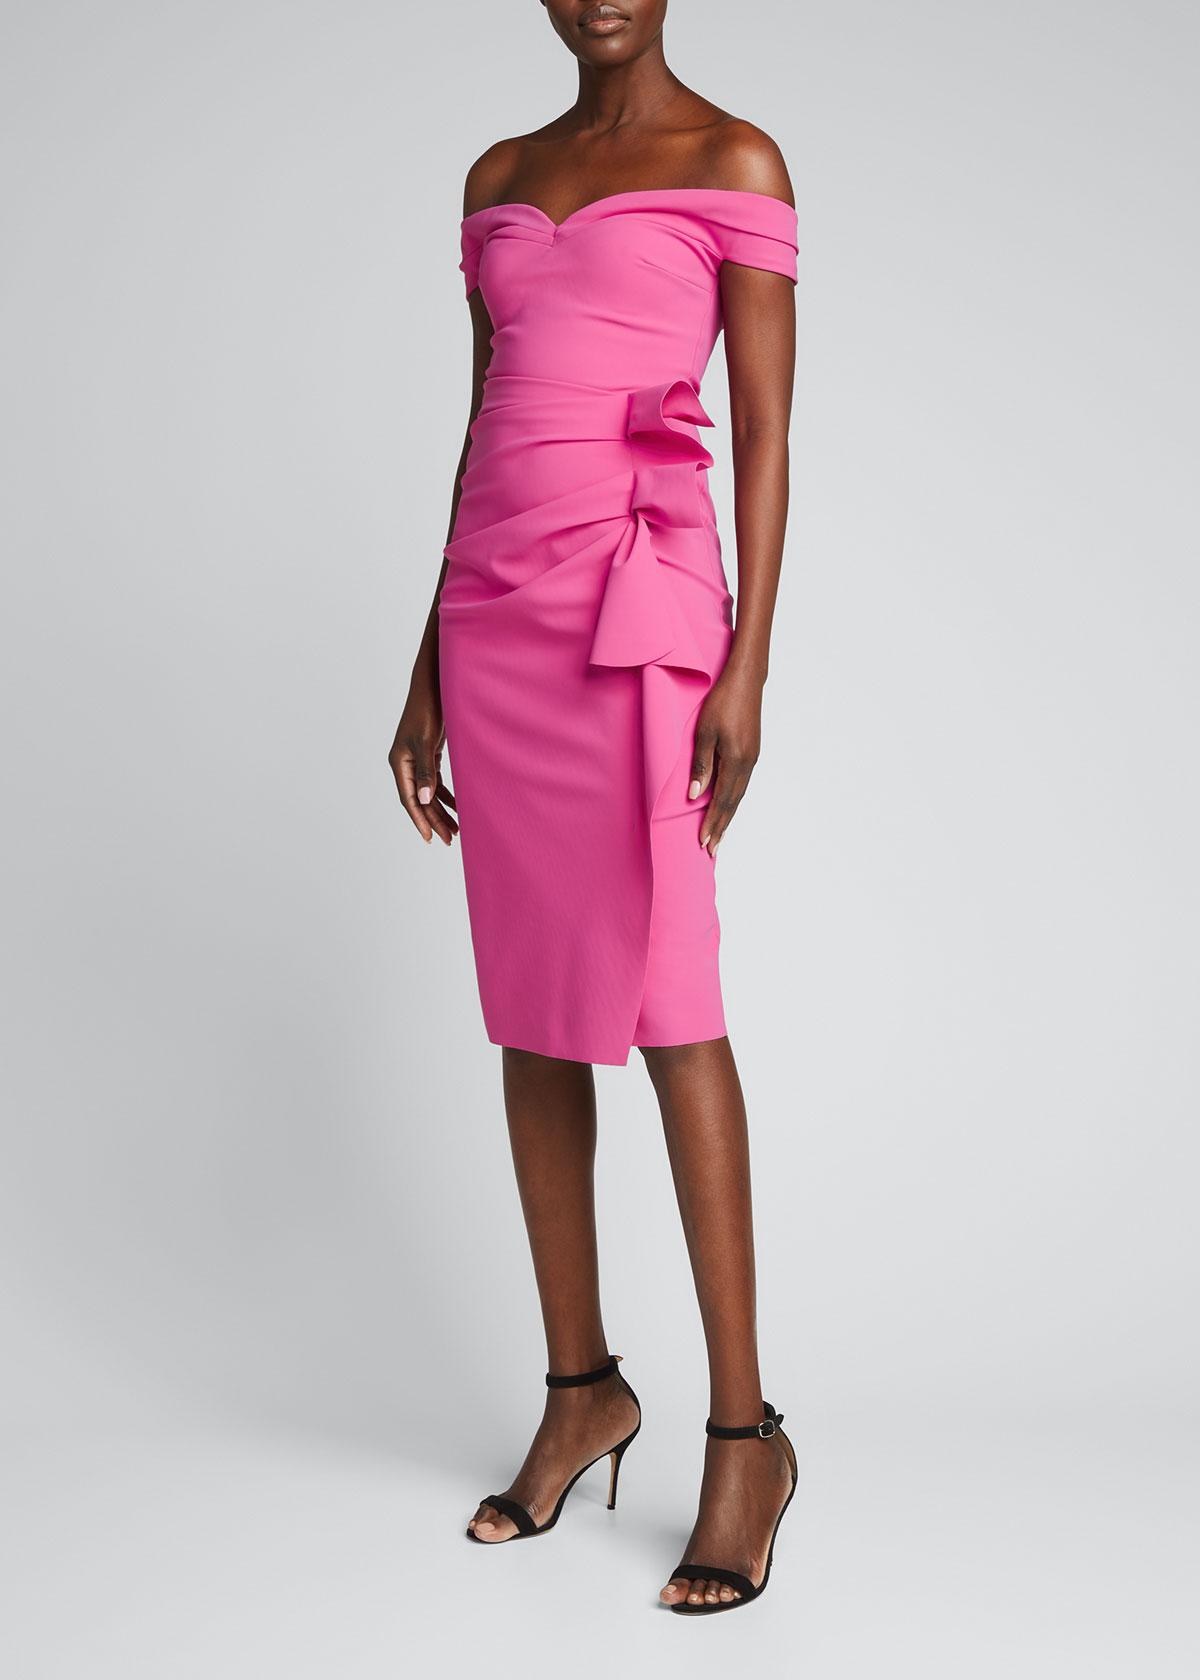 Chiara Boni La Petite Robe RADOSLAVA SIDE-DRAPED OFF-THE-SHOULDER DRESS